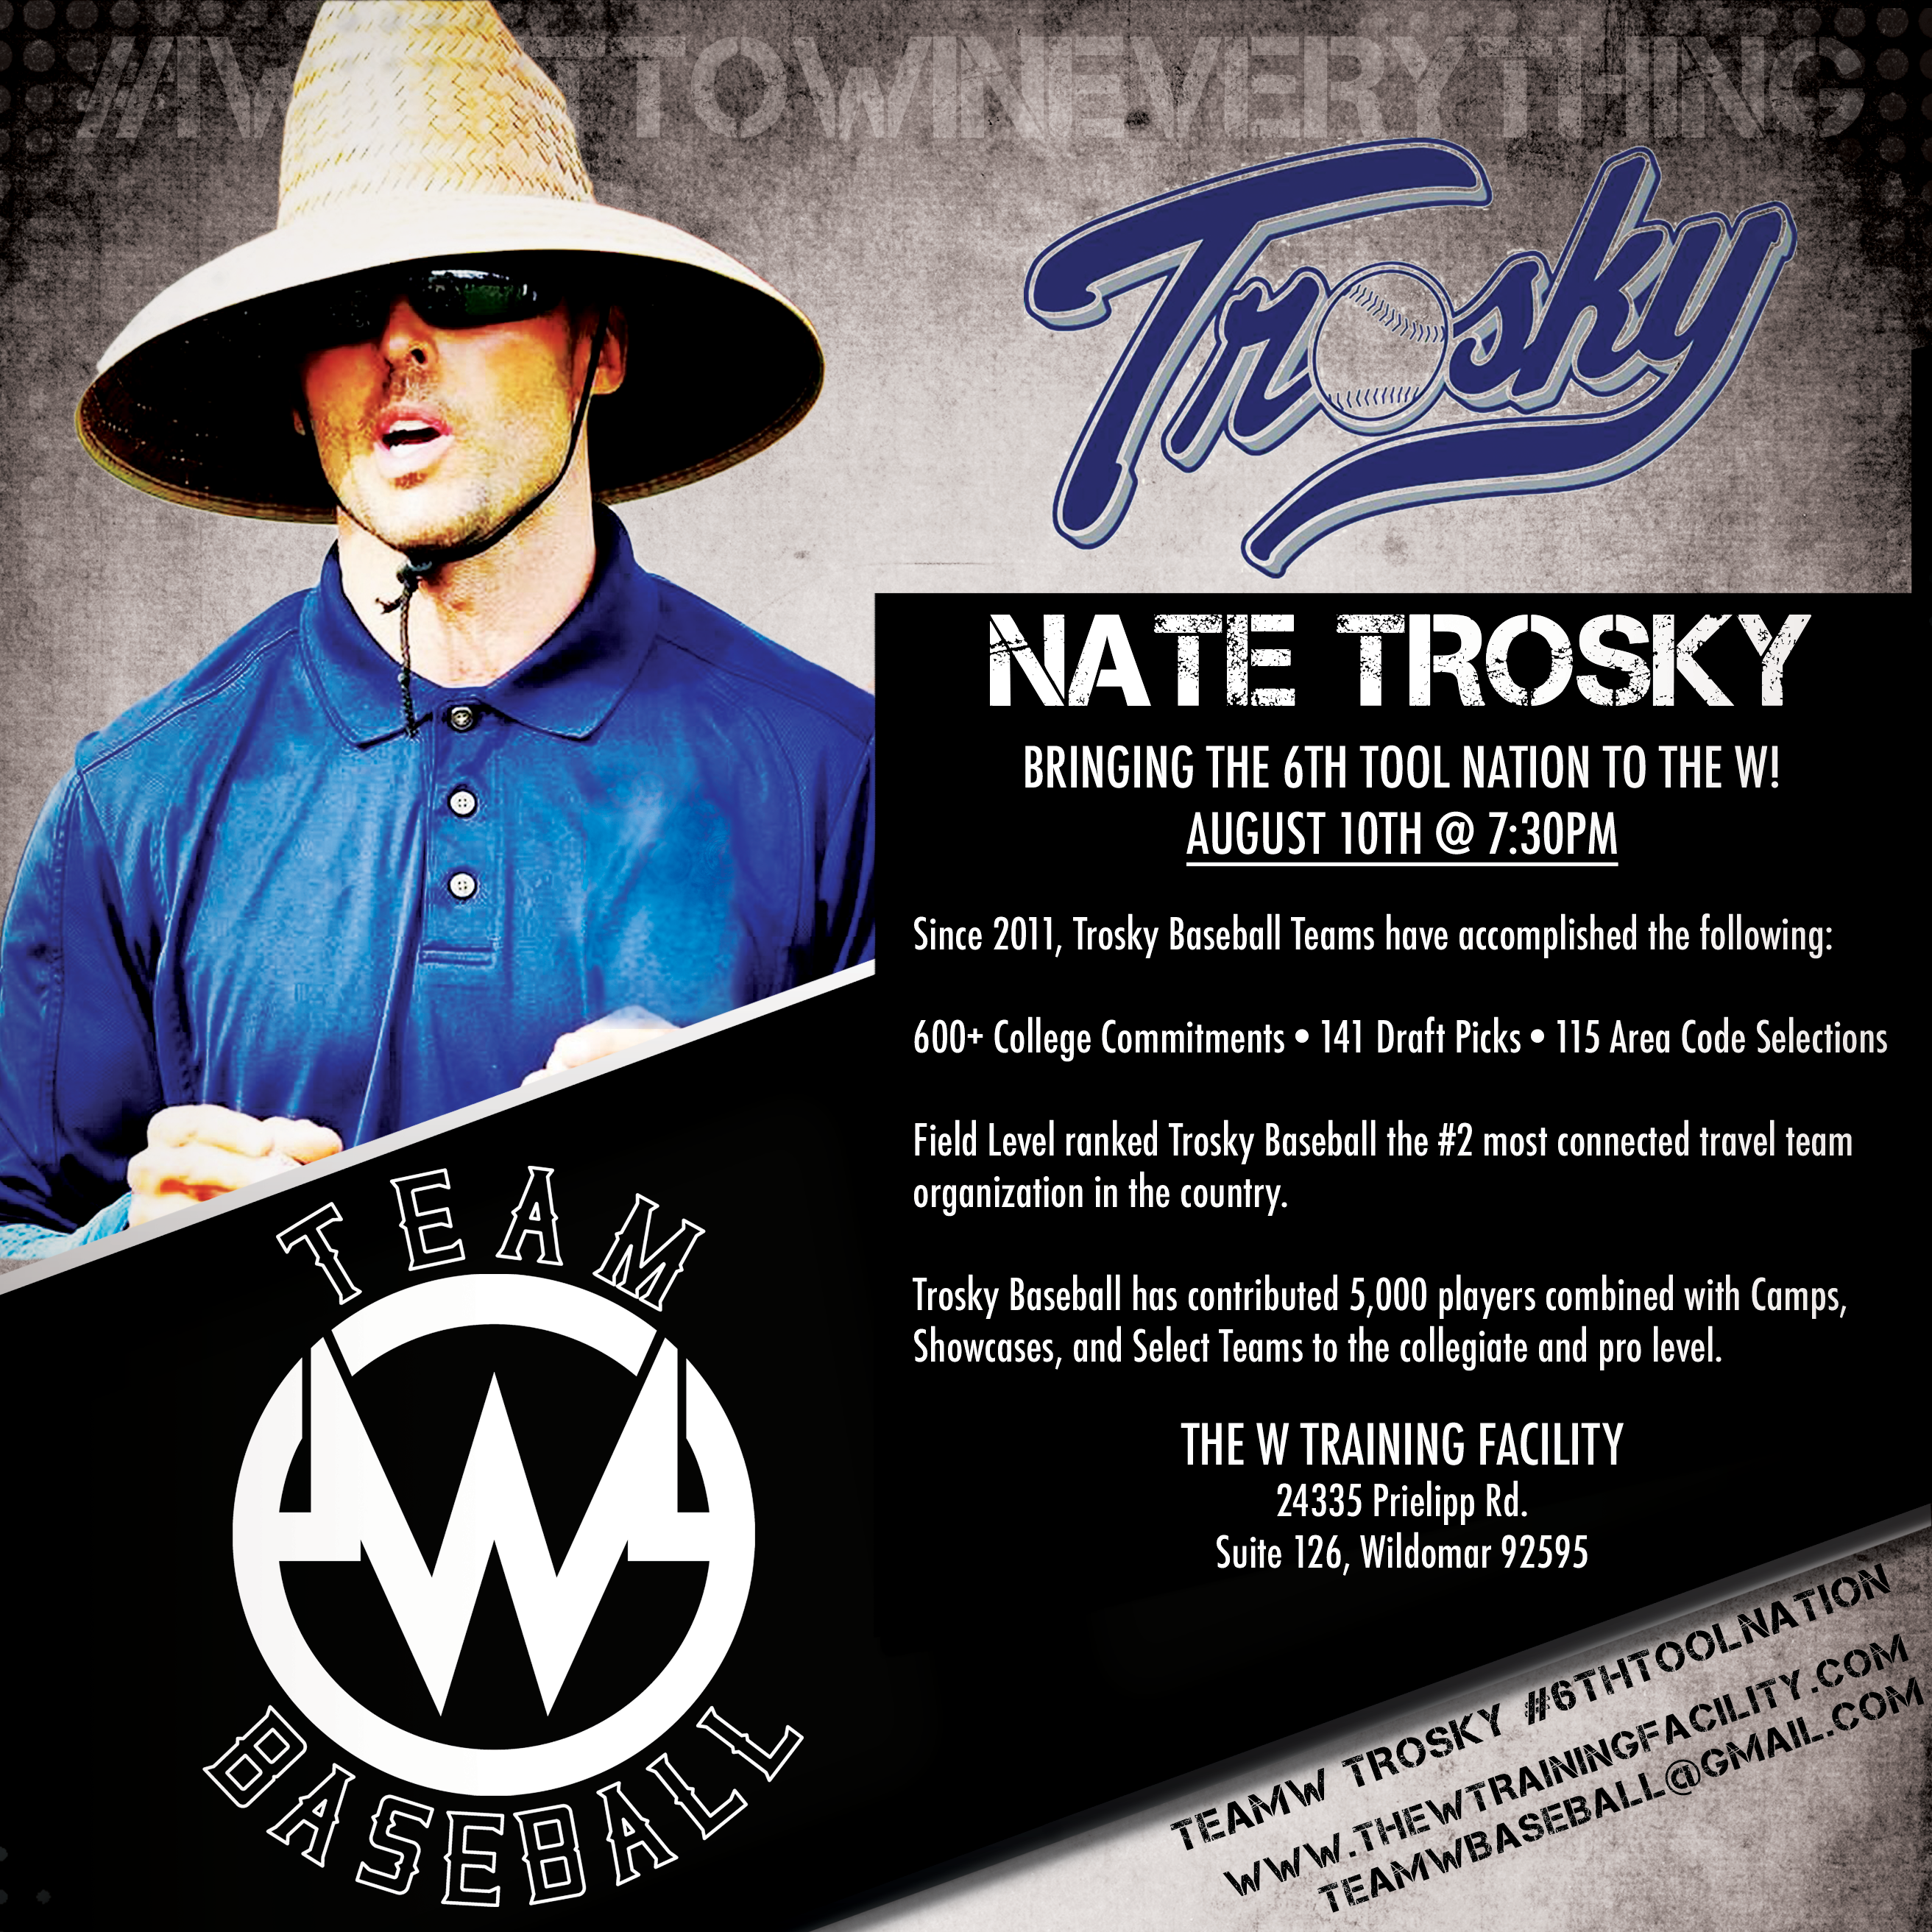 thew-instagram-instructor-meet-trosky